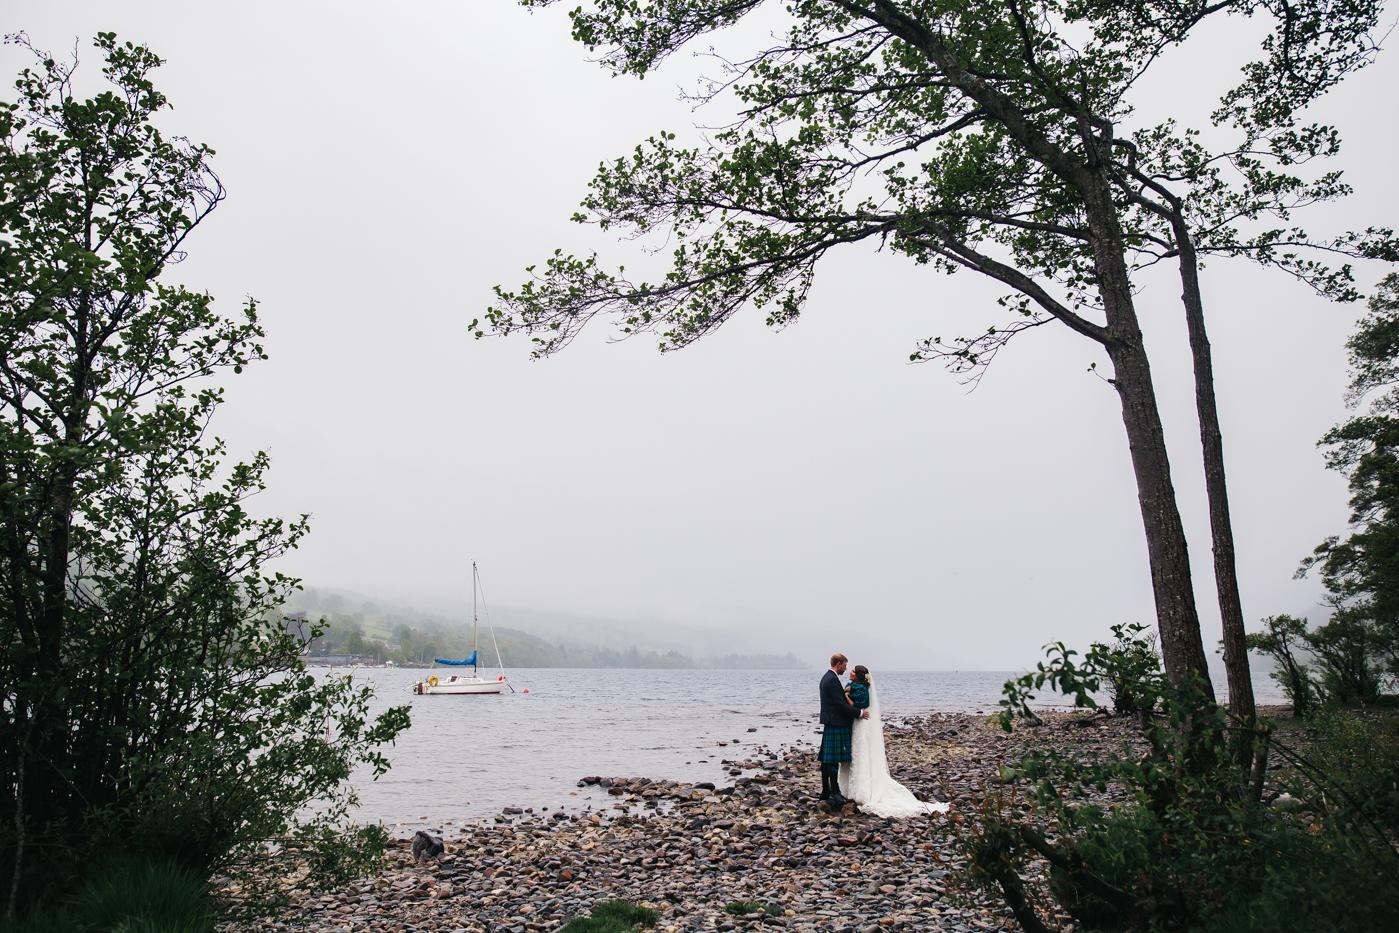 scottish-wedding-trossachs-loch-tay-highlannds-relaxed-photography-photographer-0029.jpg